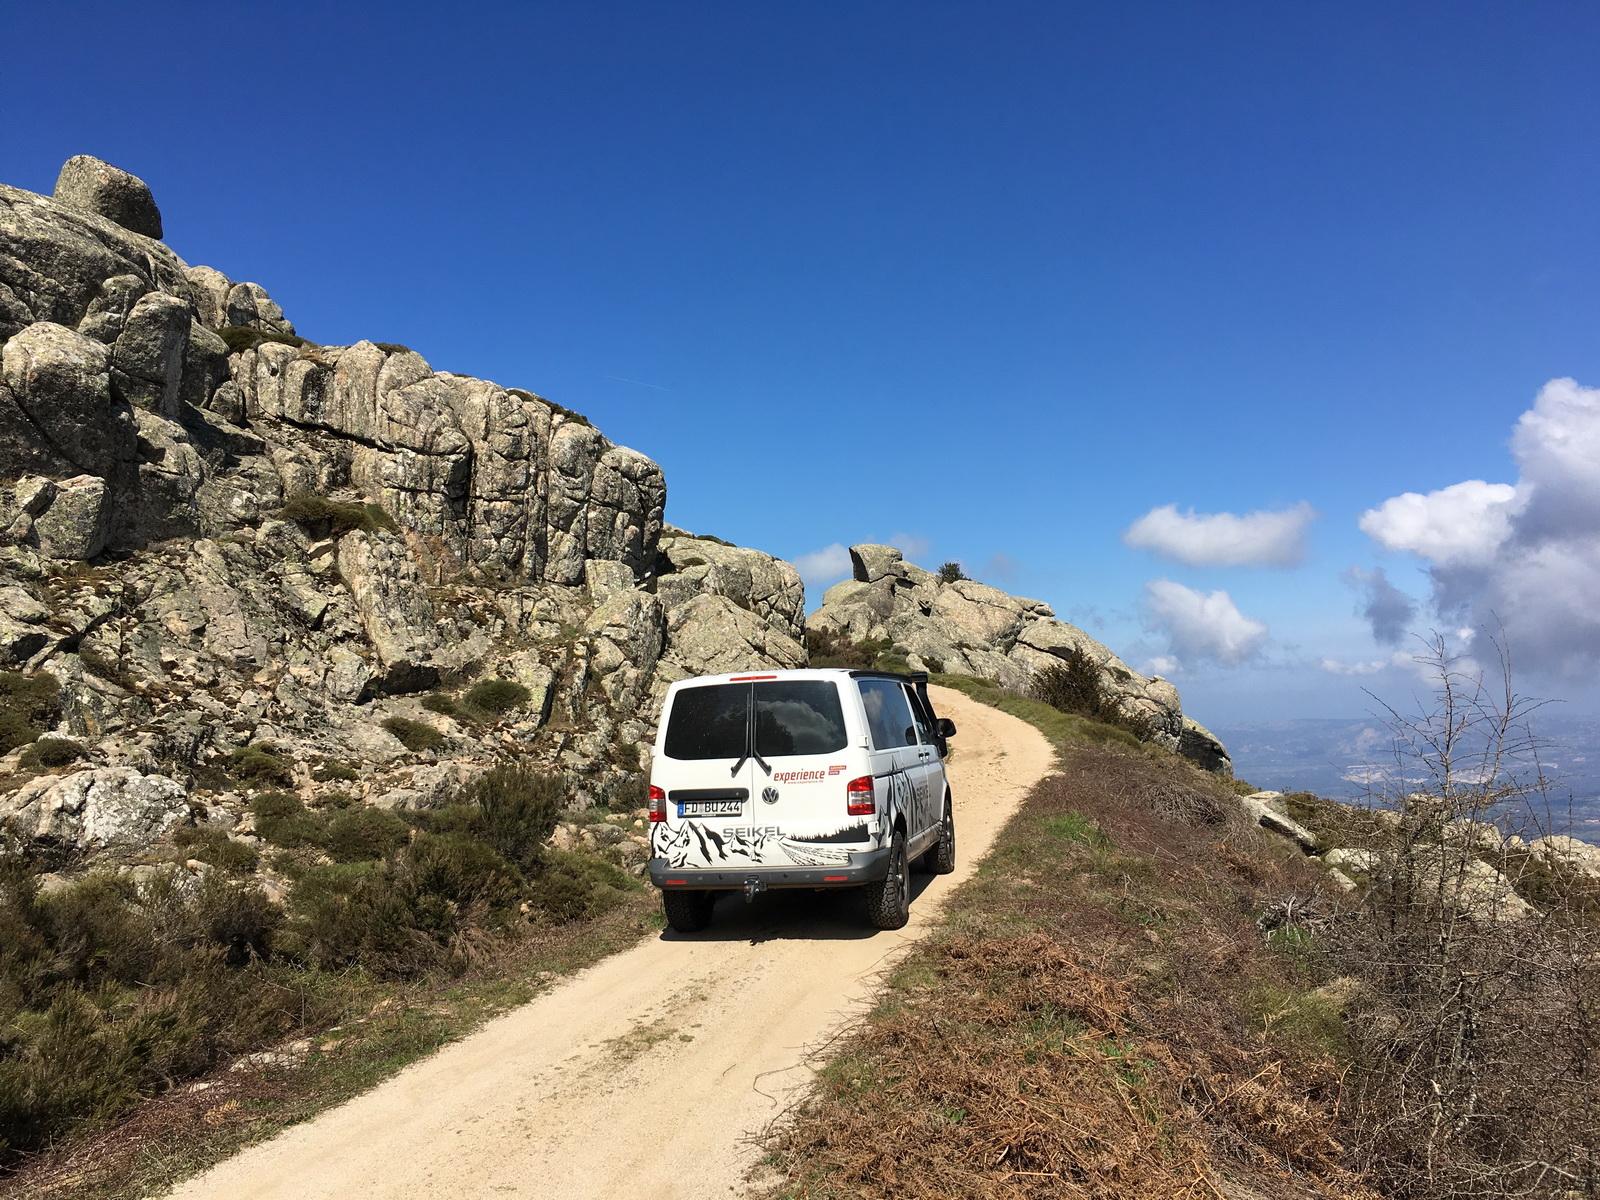 2018-04-14 Trackbook Sardinien 05